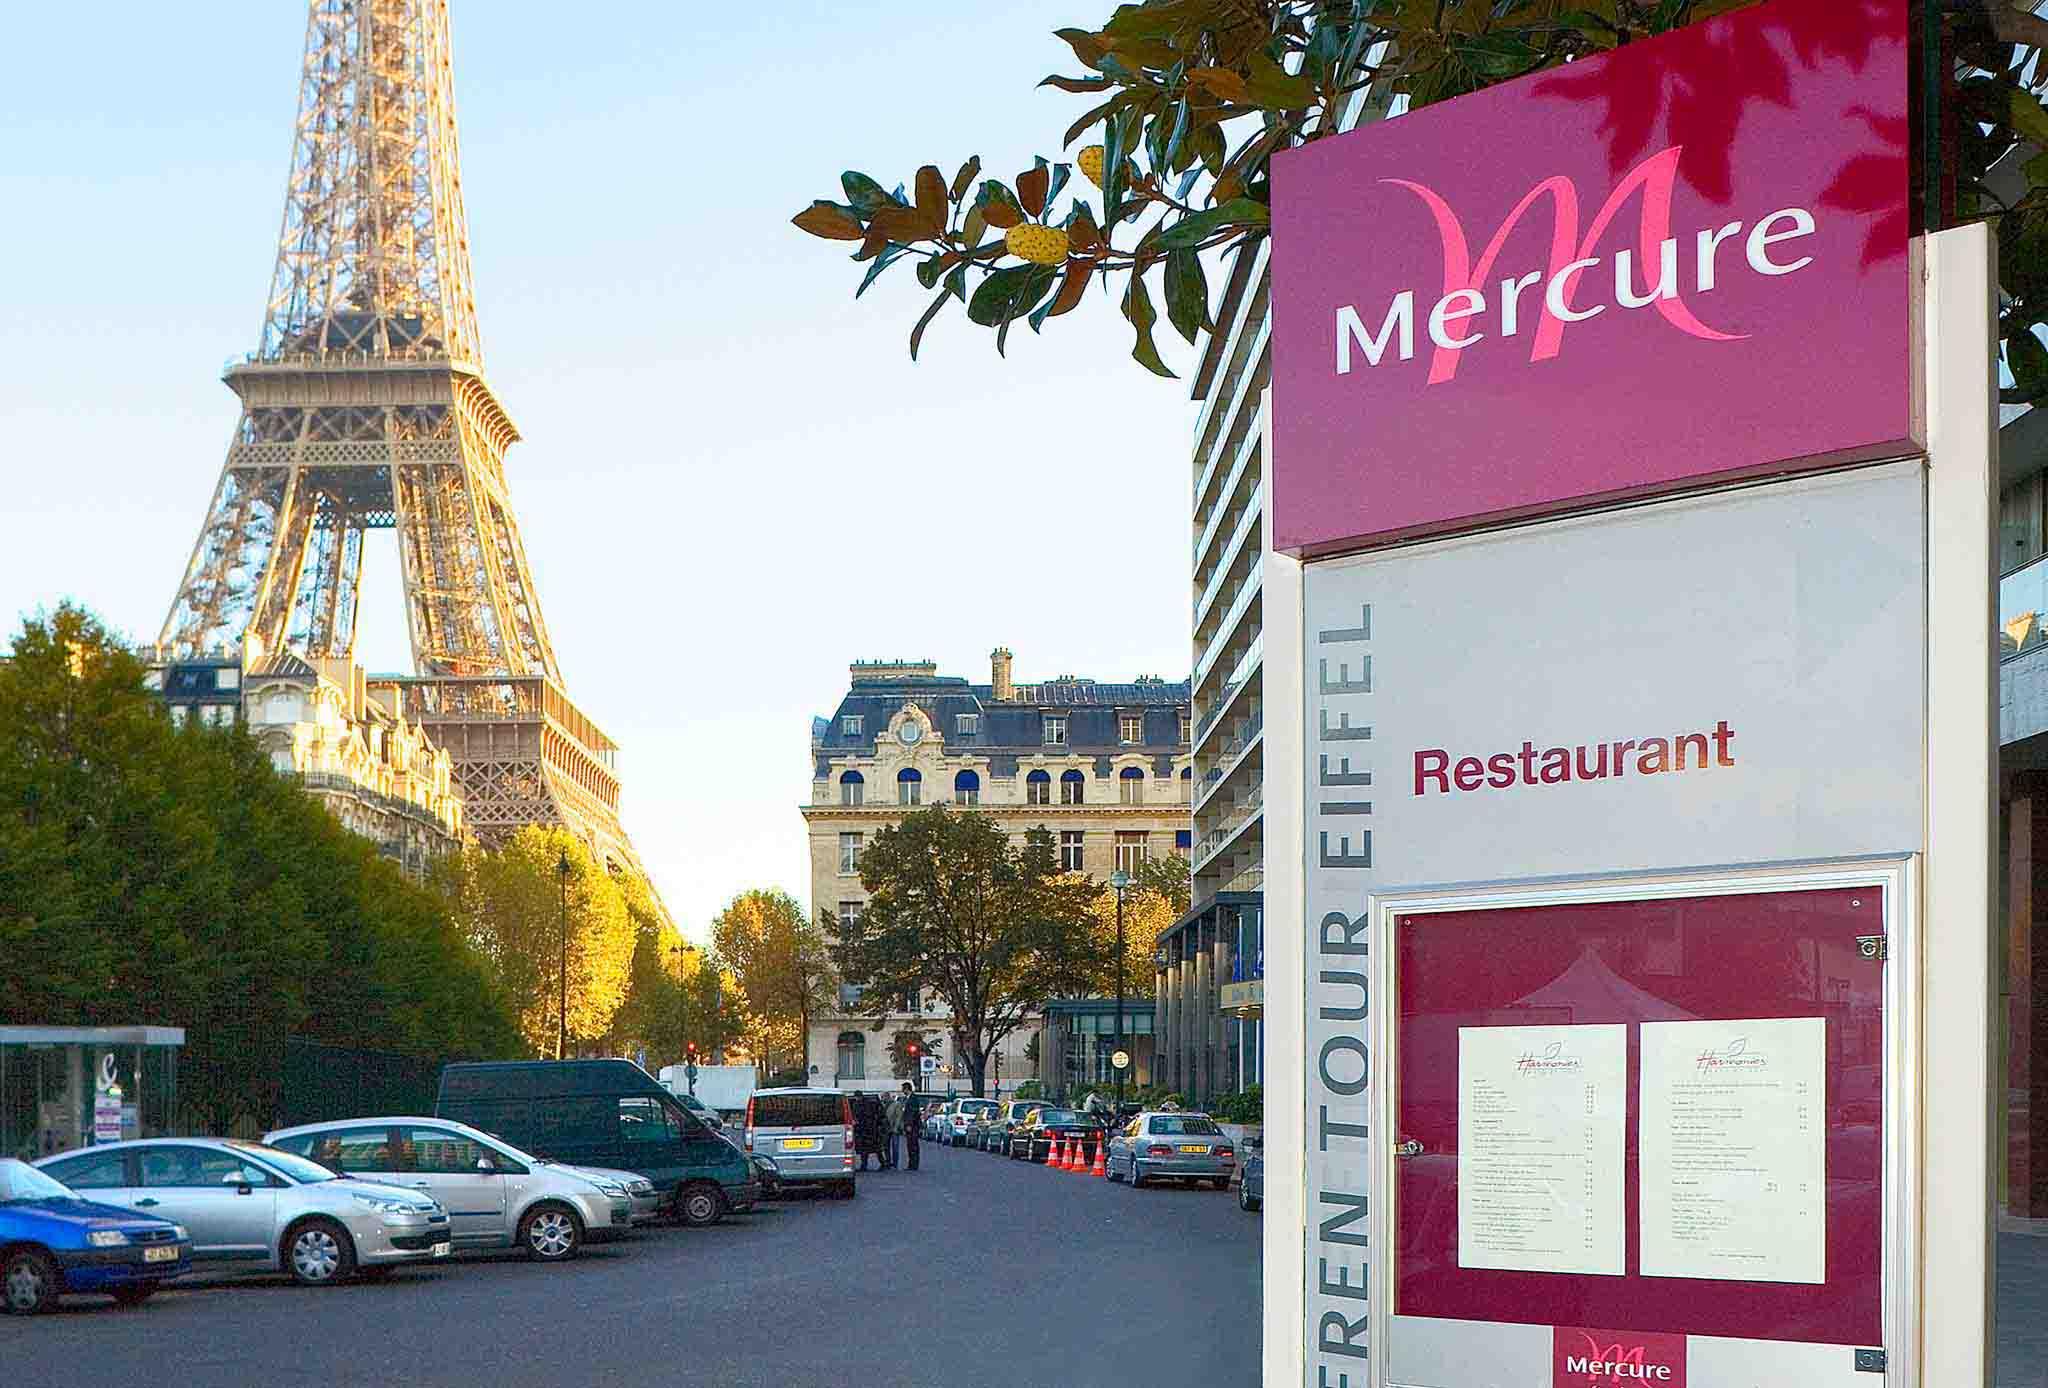 mercure-tour eiffel-hotel1